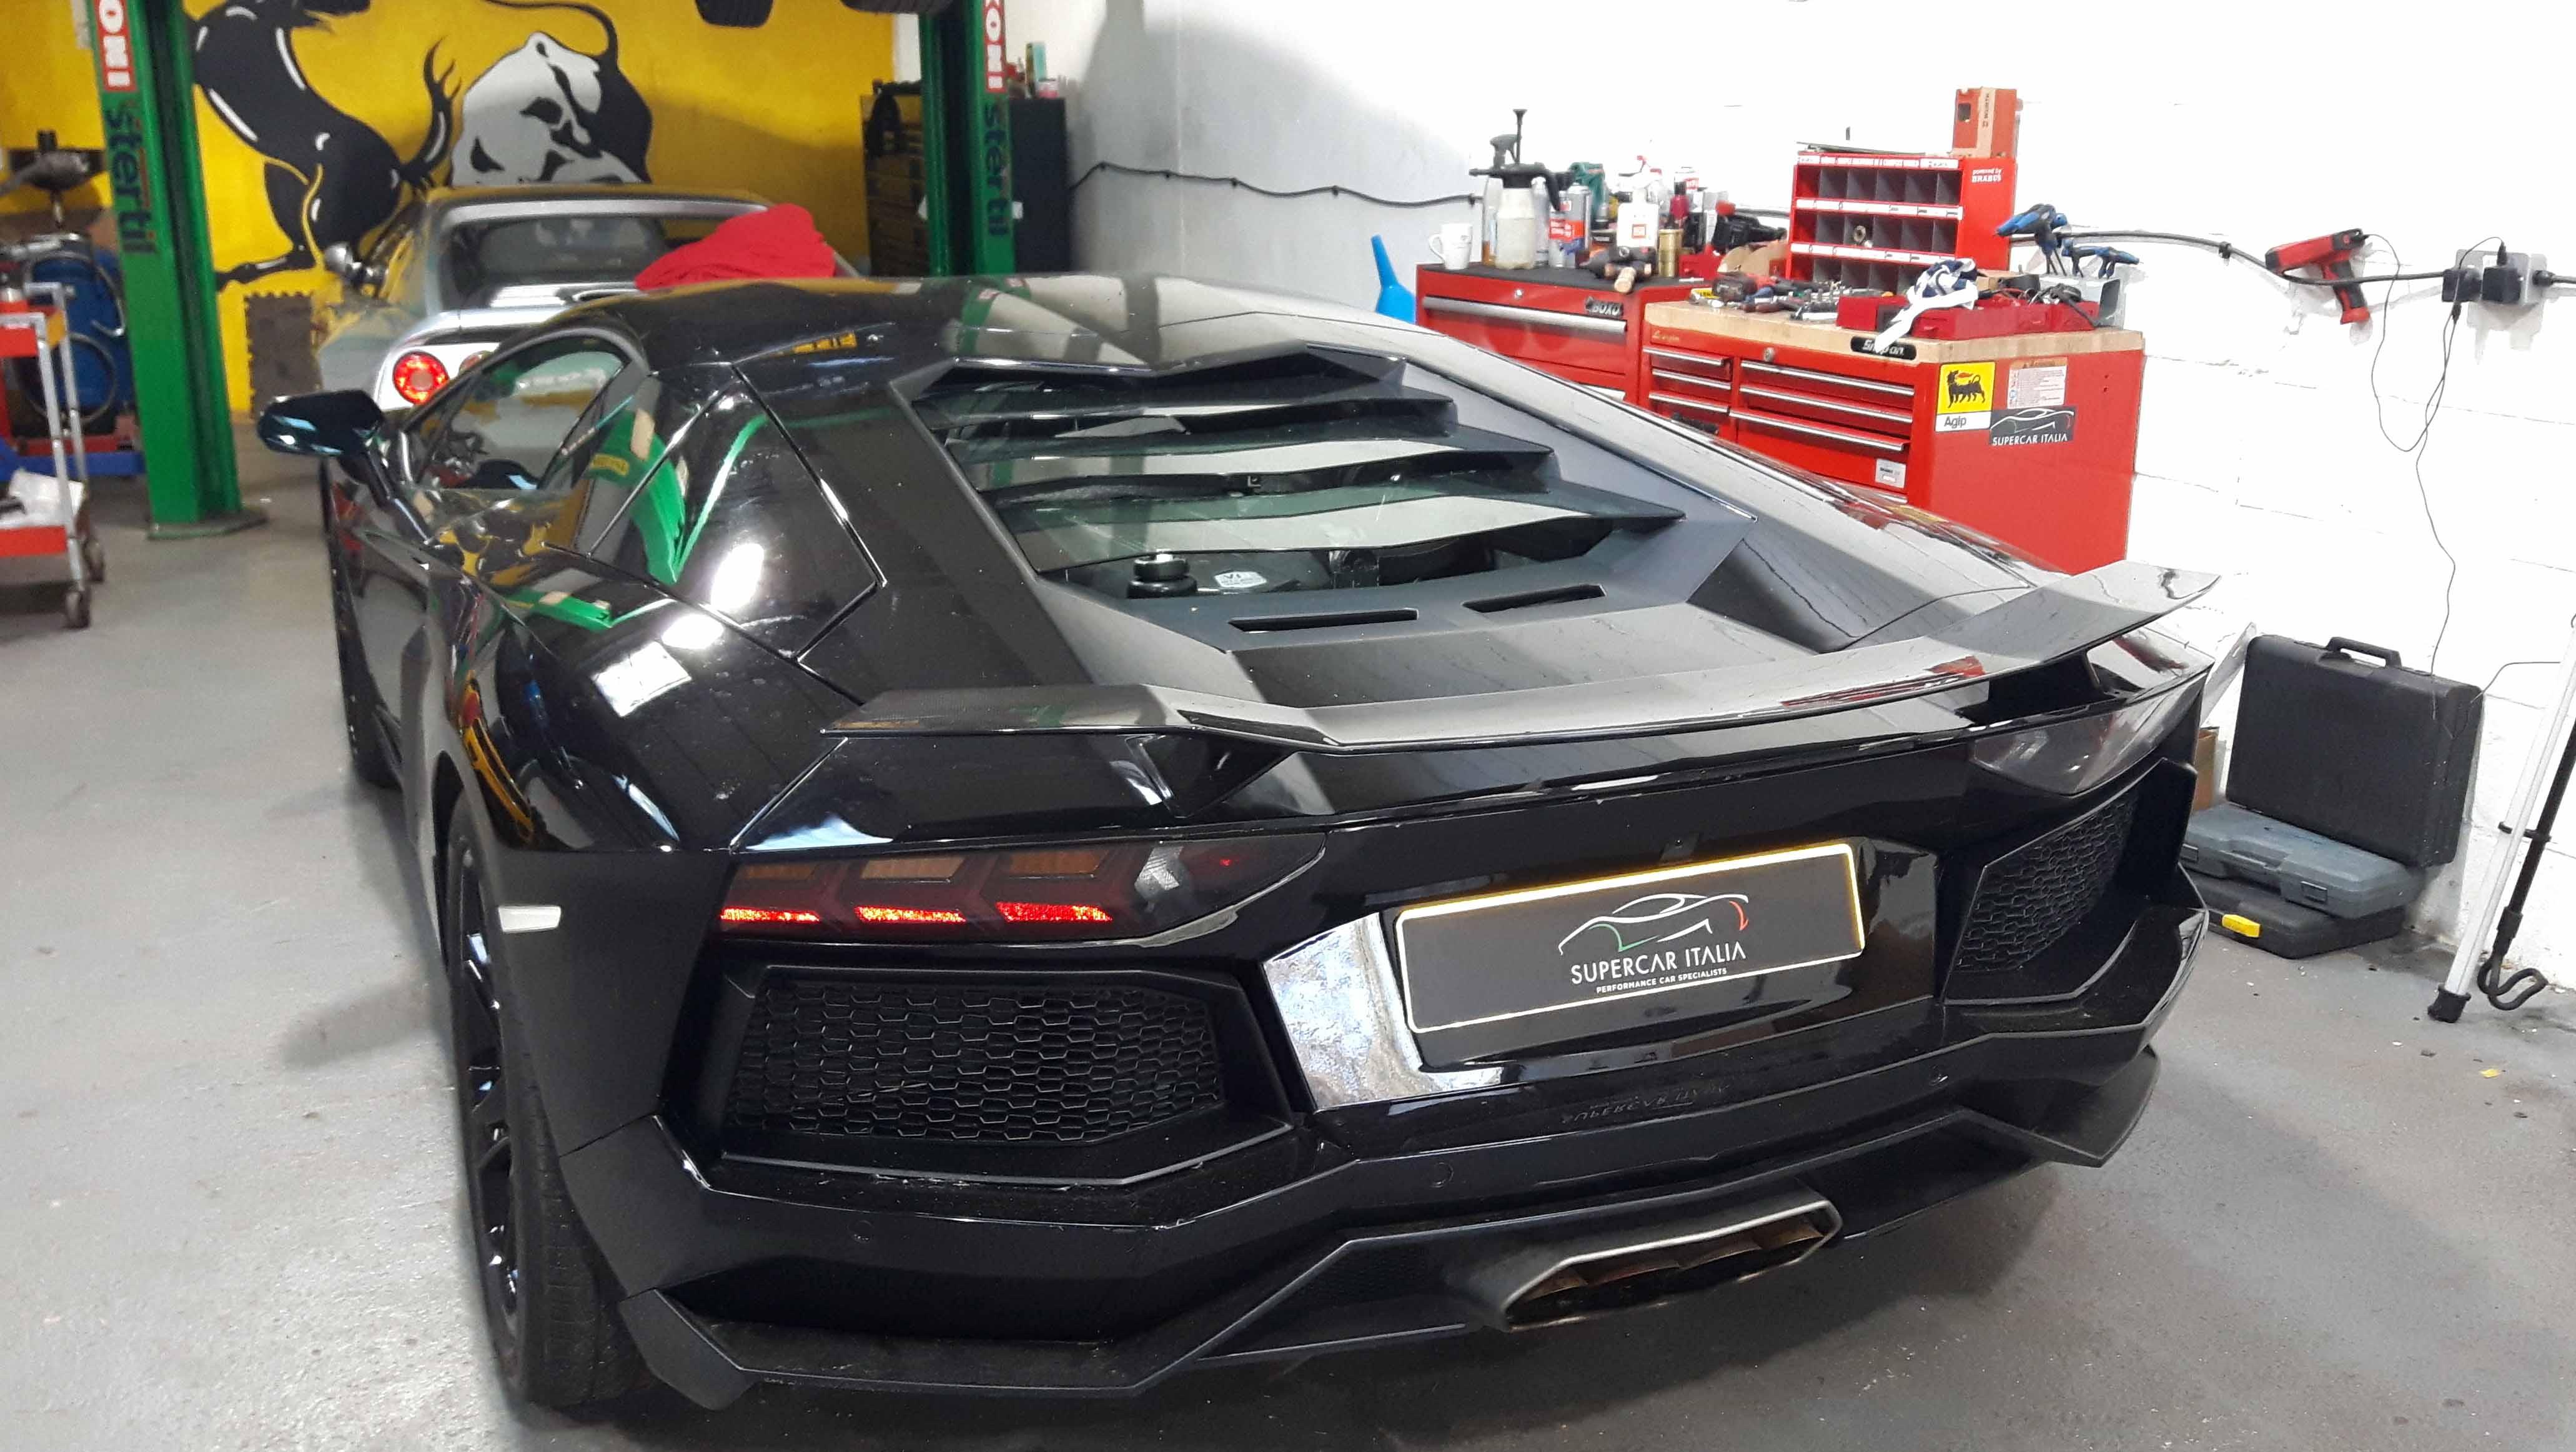 Lamborghini Specialists London Kent Surrey Supercar Italia